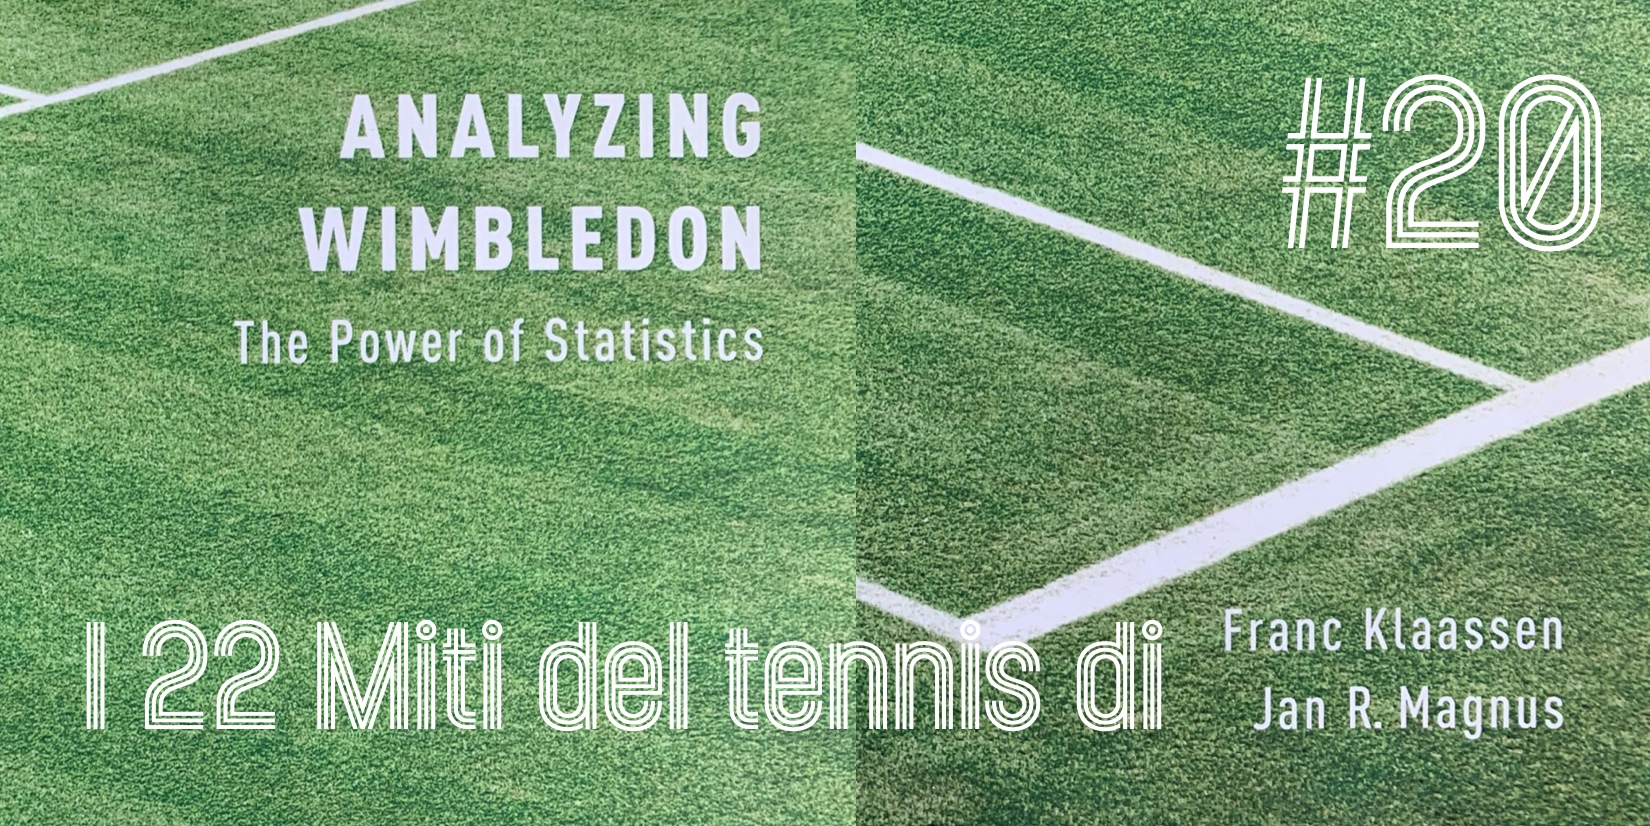 I 22 miti del tennis di Klaassen & Magnus – Mito 20 - settesei.it